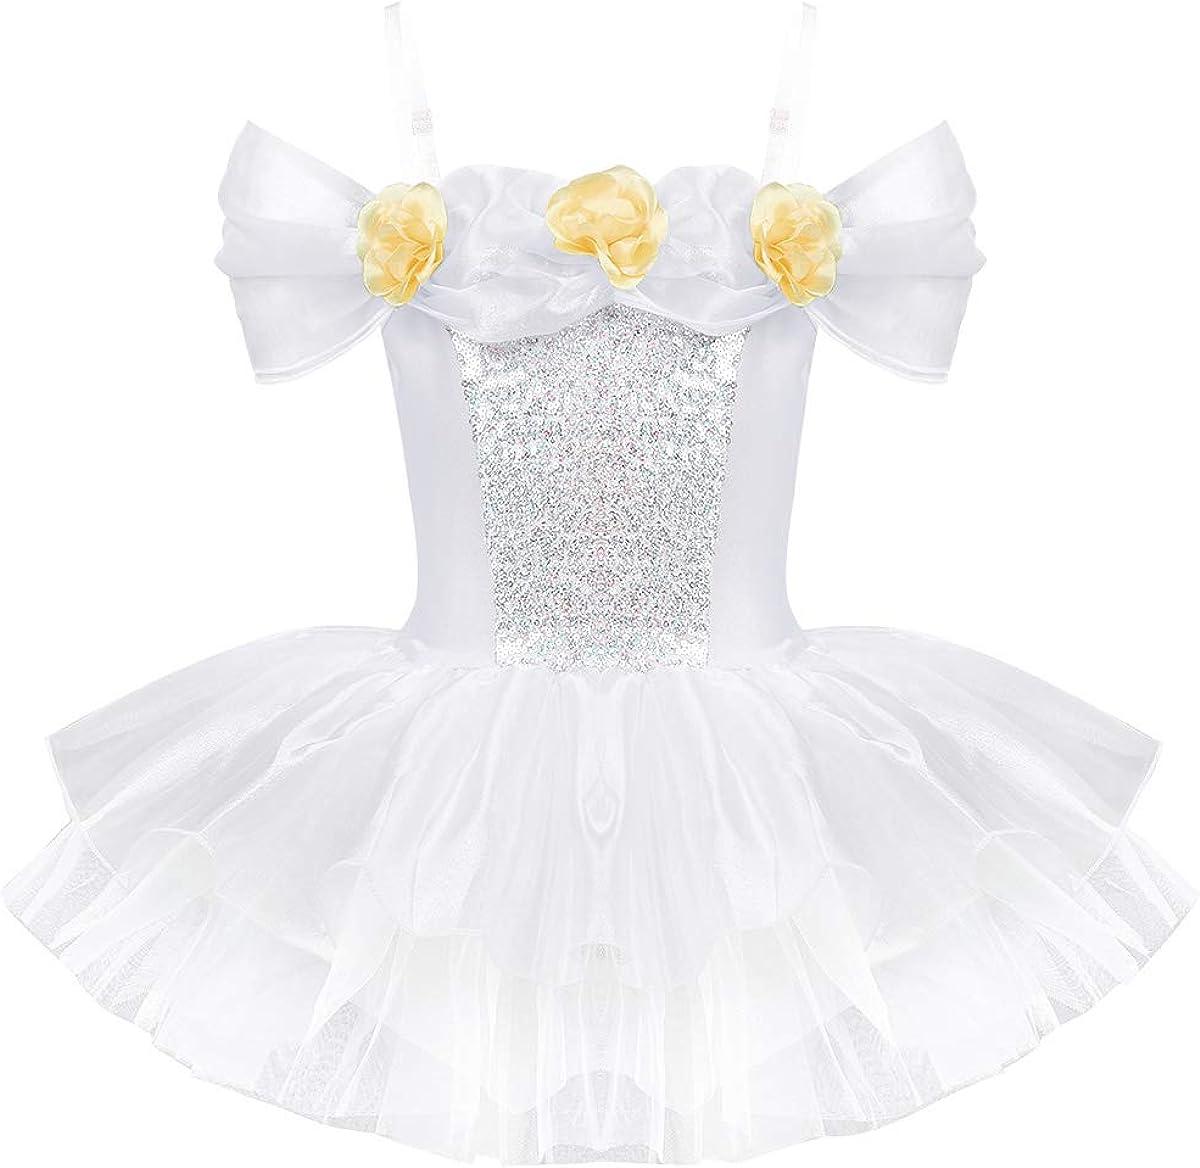 Alvivi Kids Girls Off Large-scale sale Shoulder 3D 100% quality warranty Prin Ballet Dress Tutu Flowers